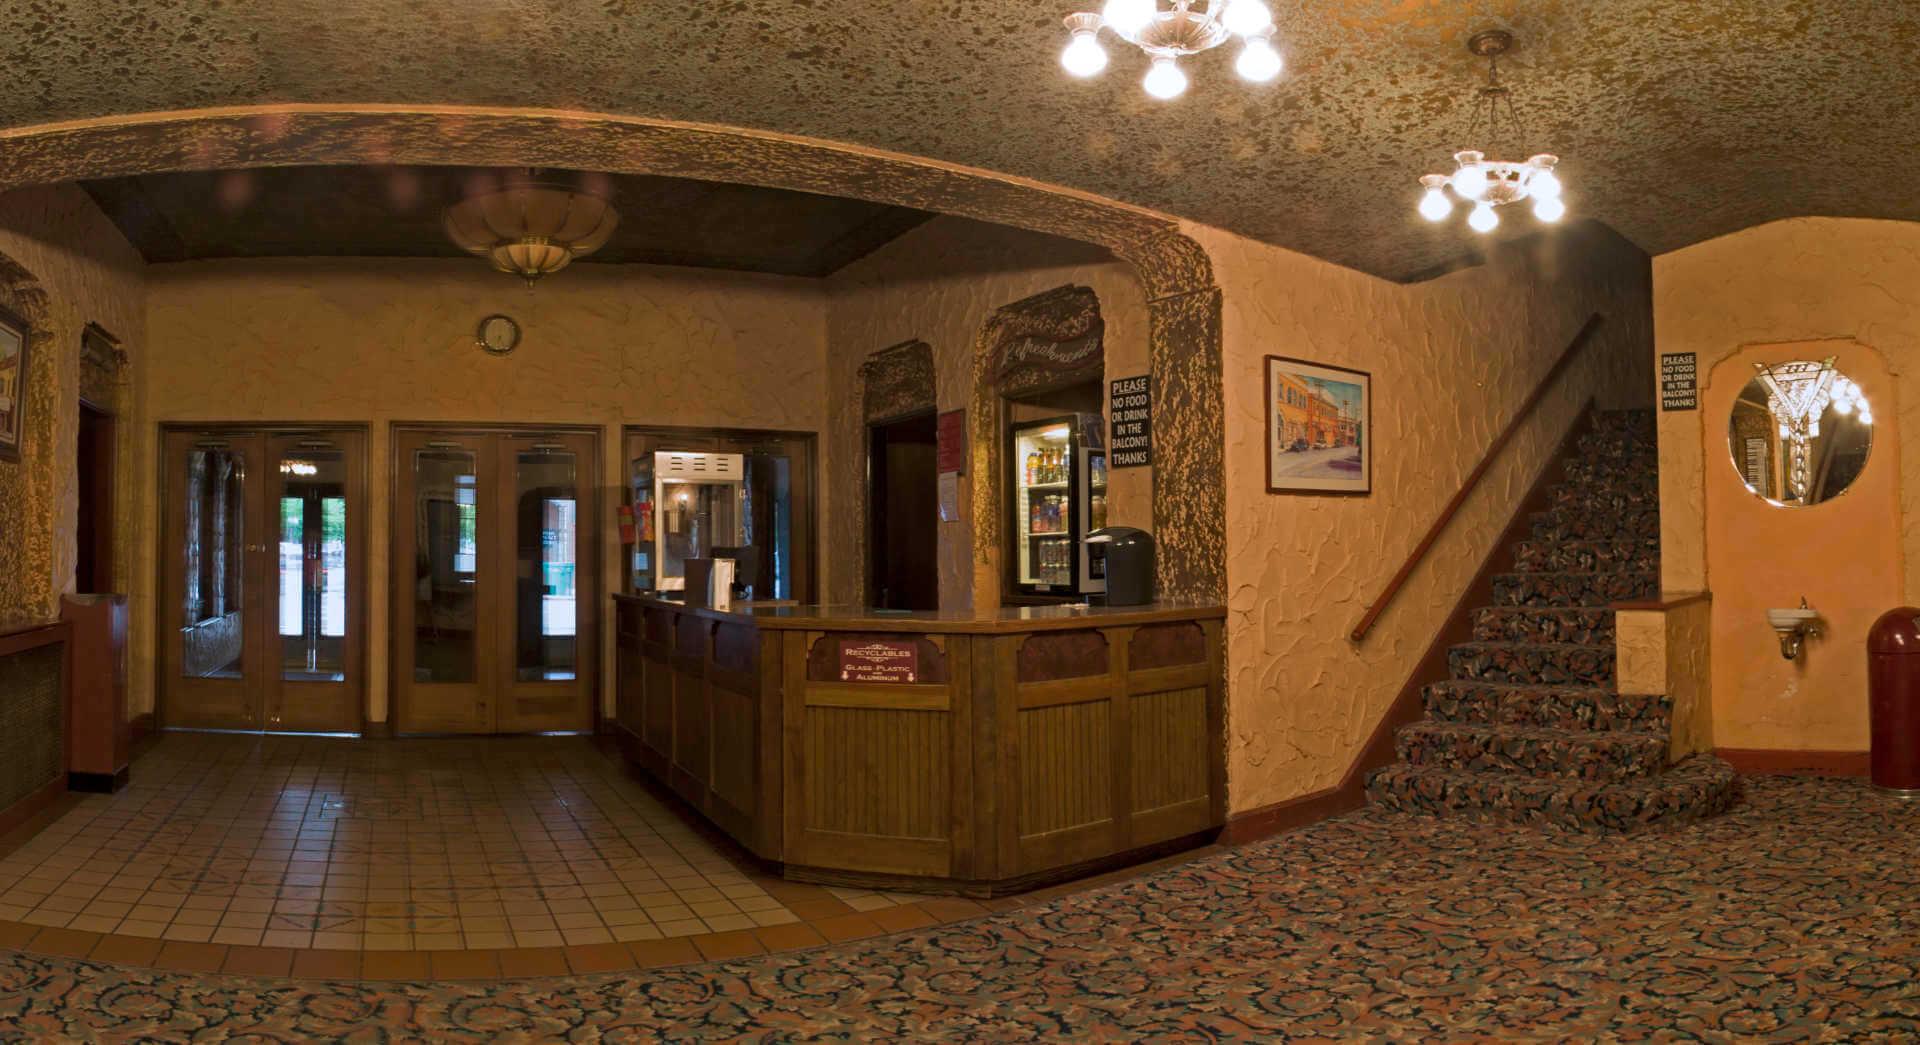 photo inside lobby at Panida Theater related to customer testimonial